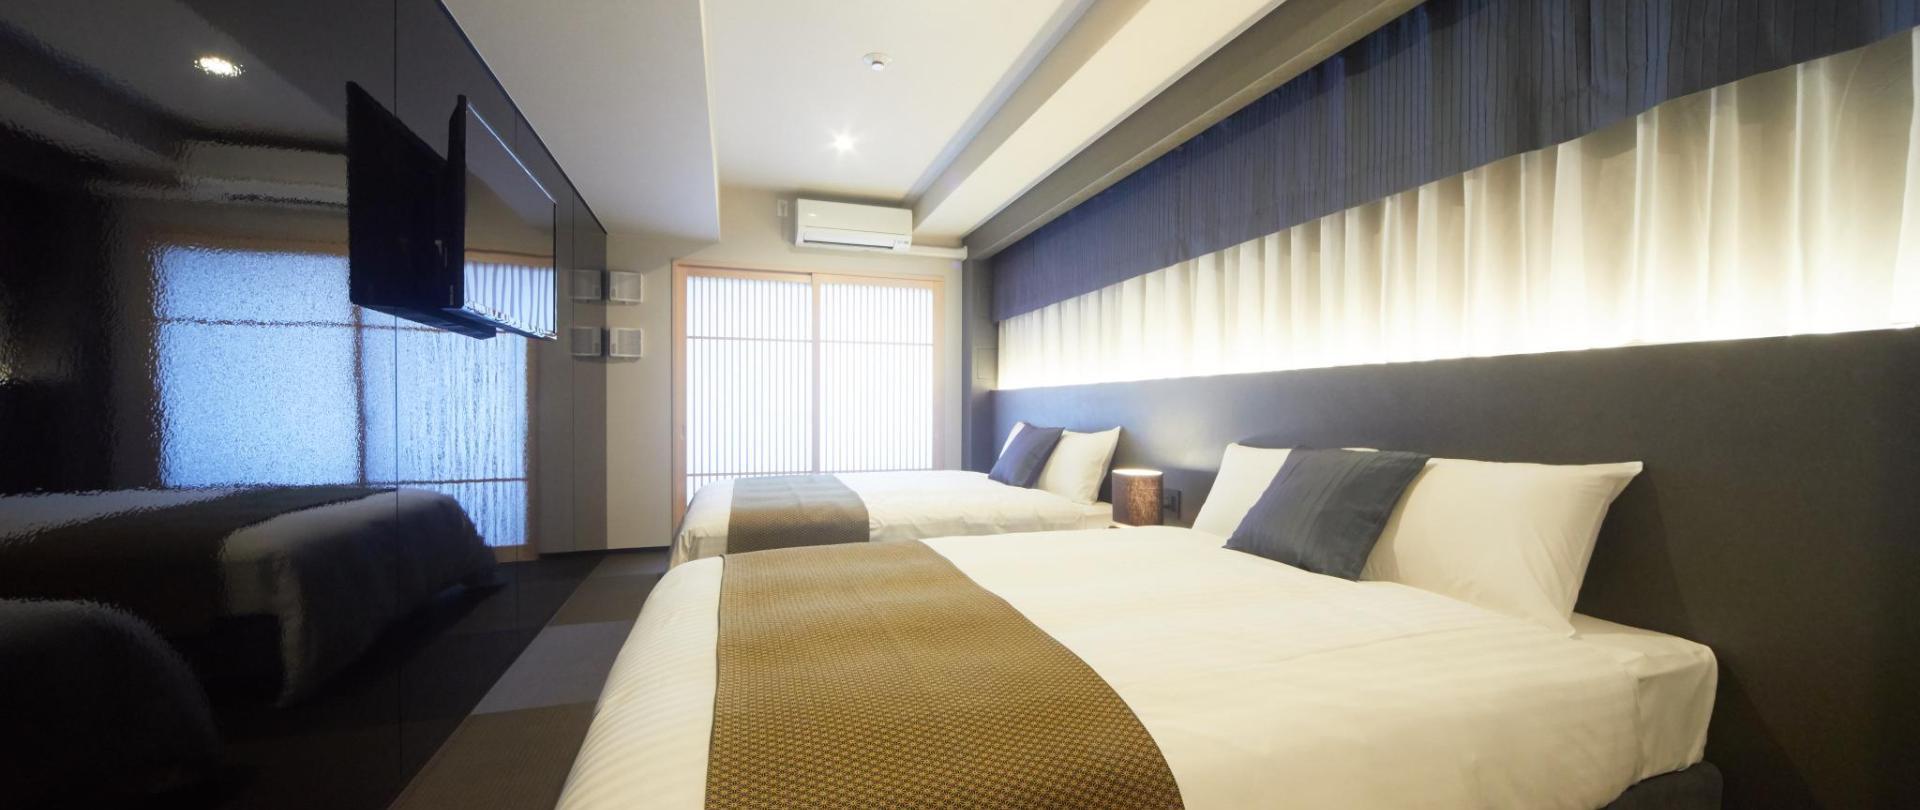 181217_HotelMondonce_140.jpg